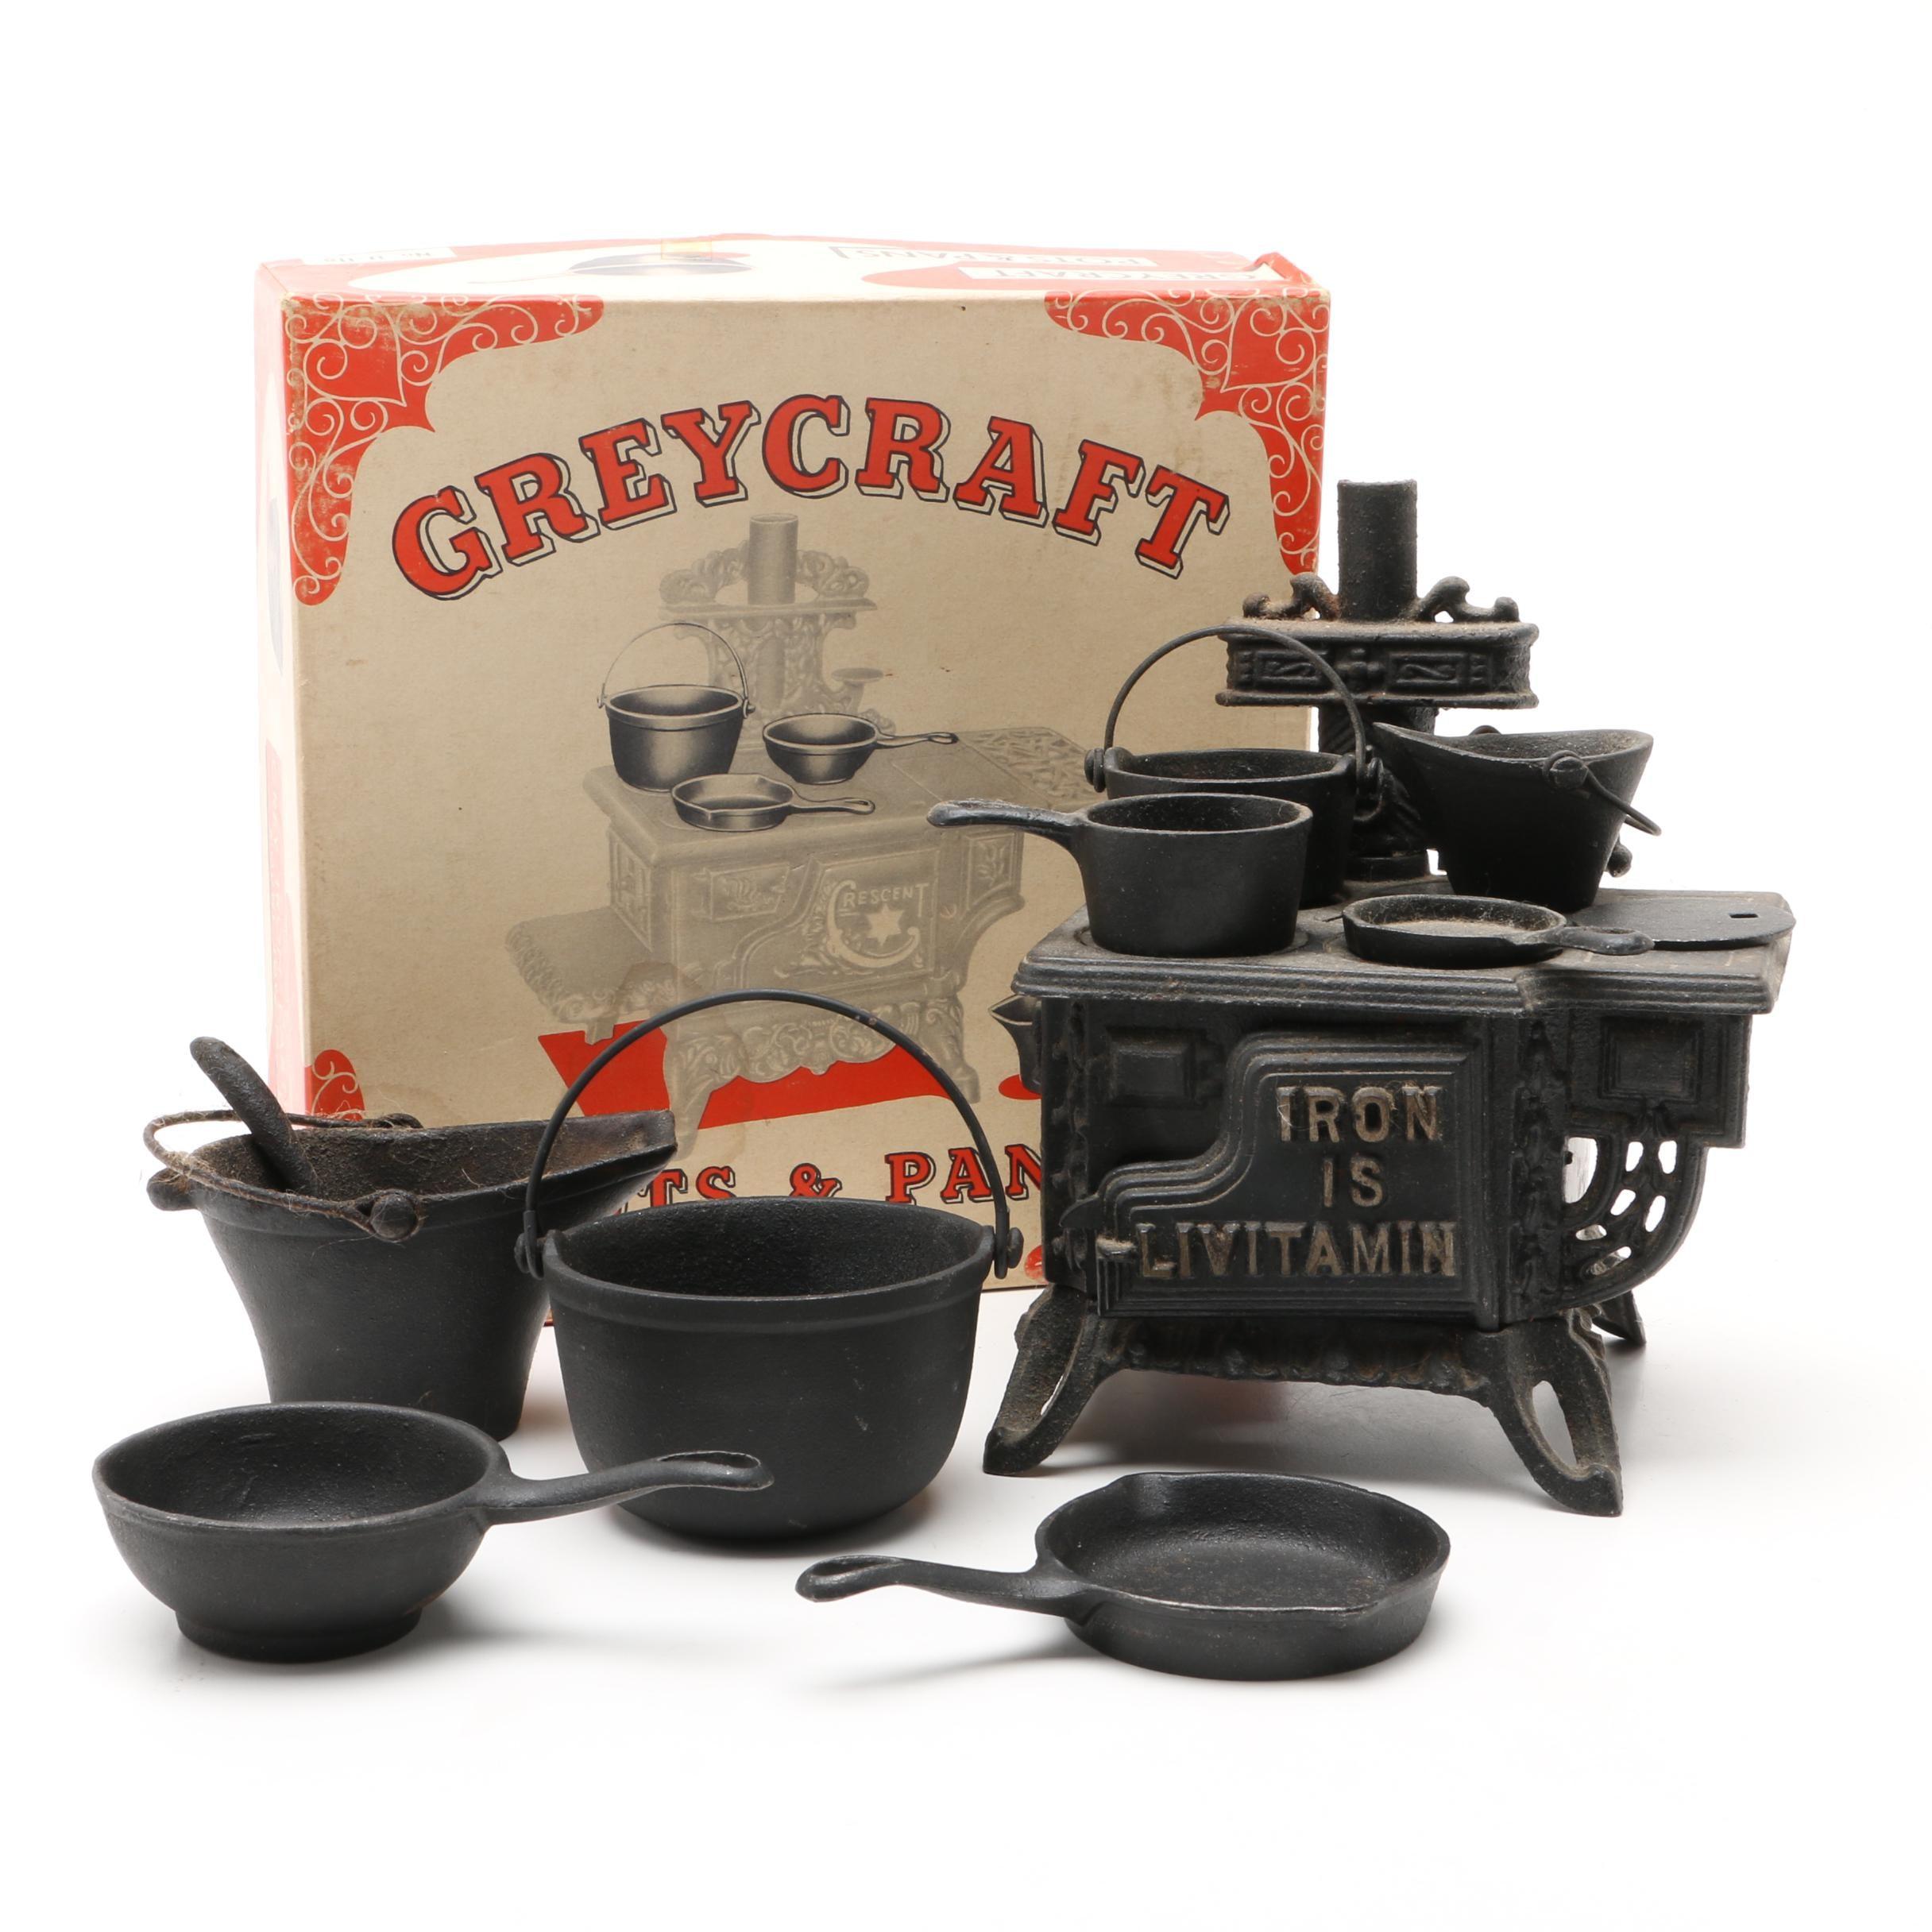 "Salesman Sample ""Iron Is Livitamin"" Cast Iron Stove and Greycraft Pans"